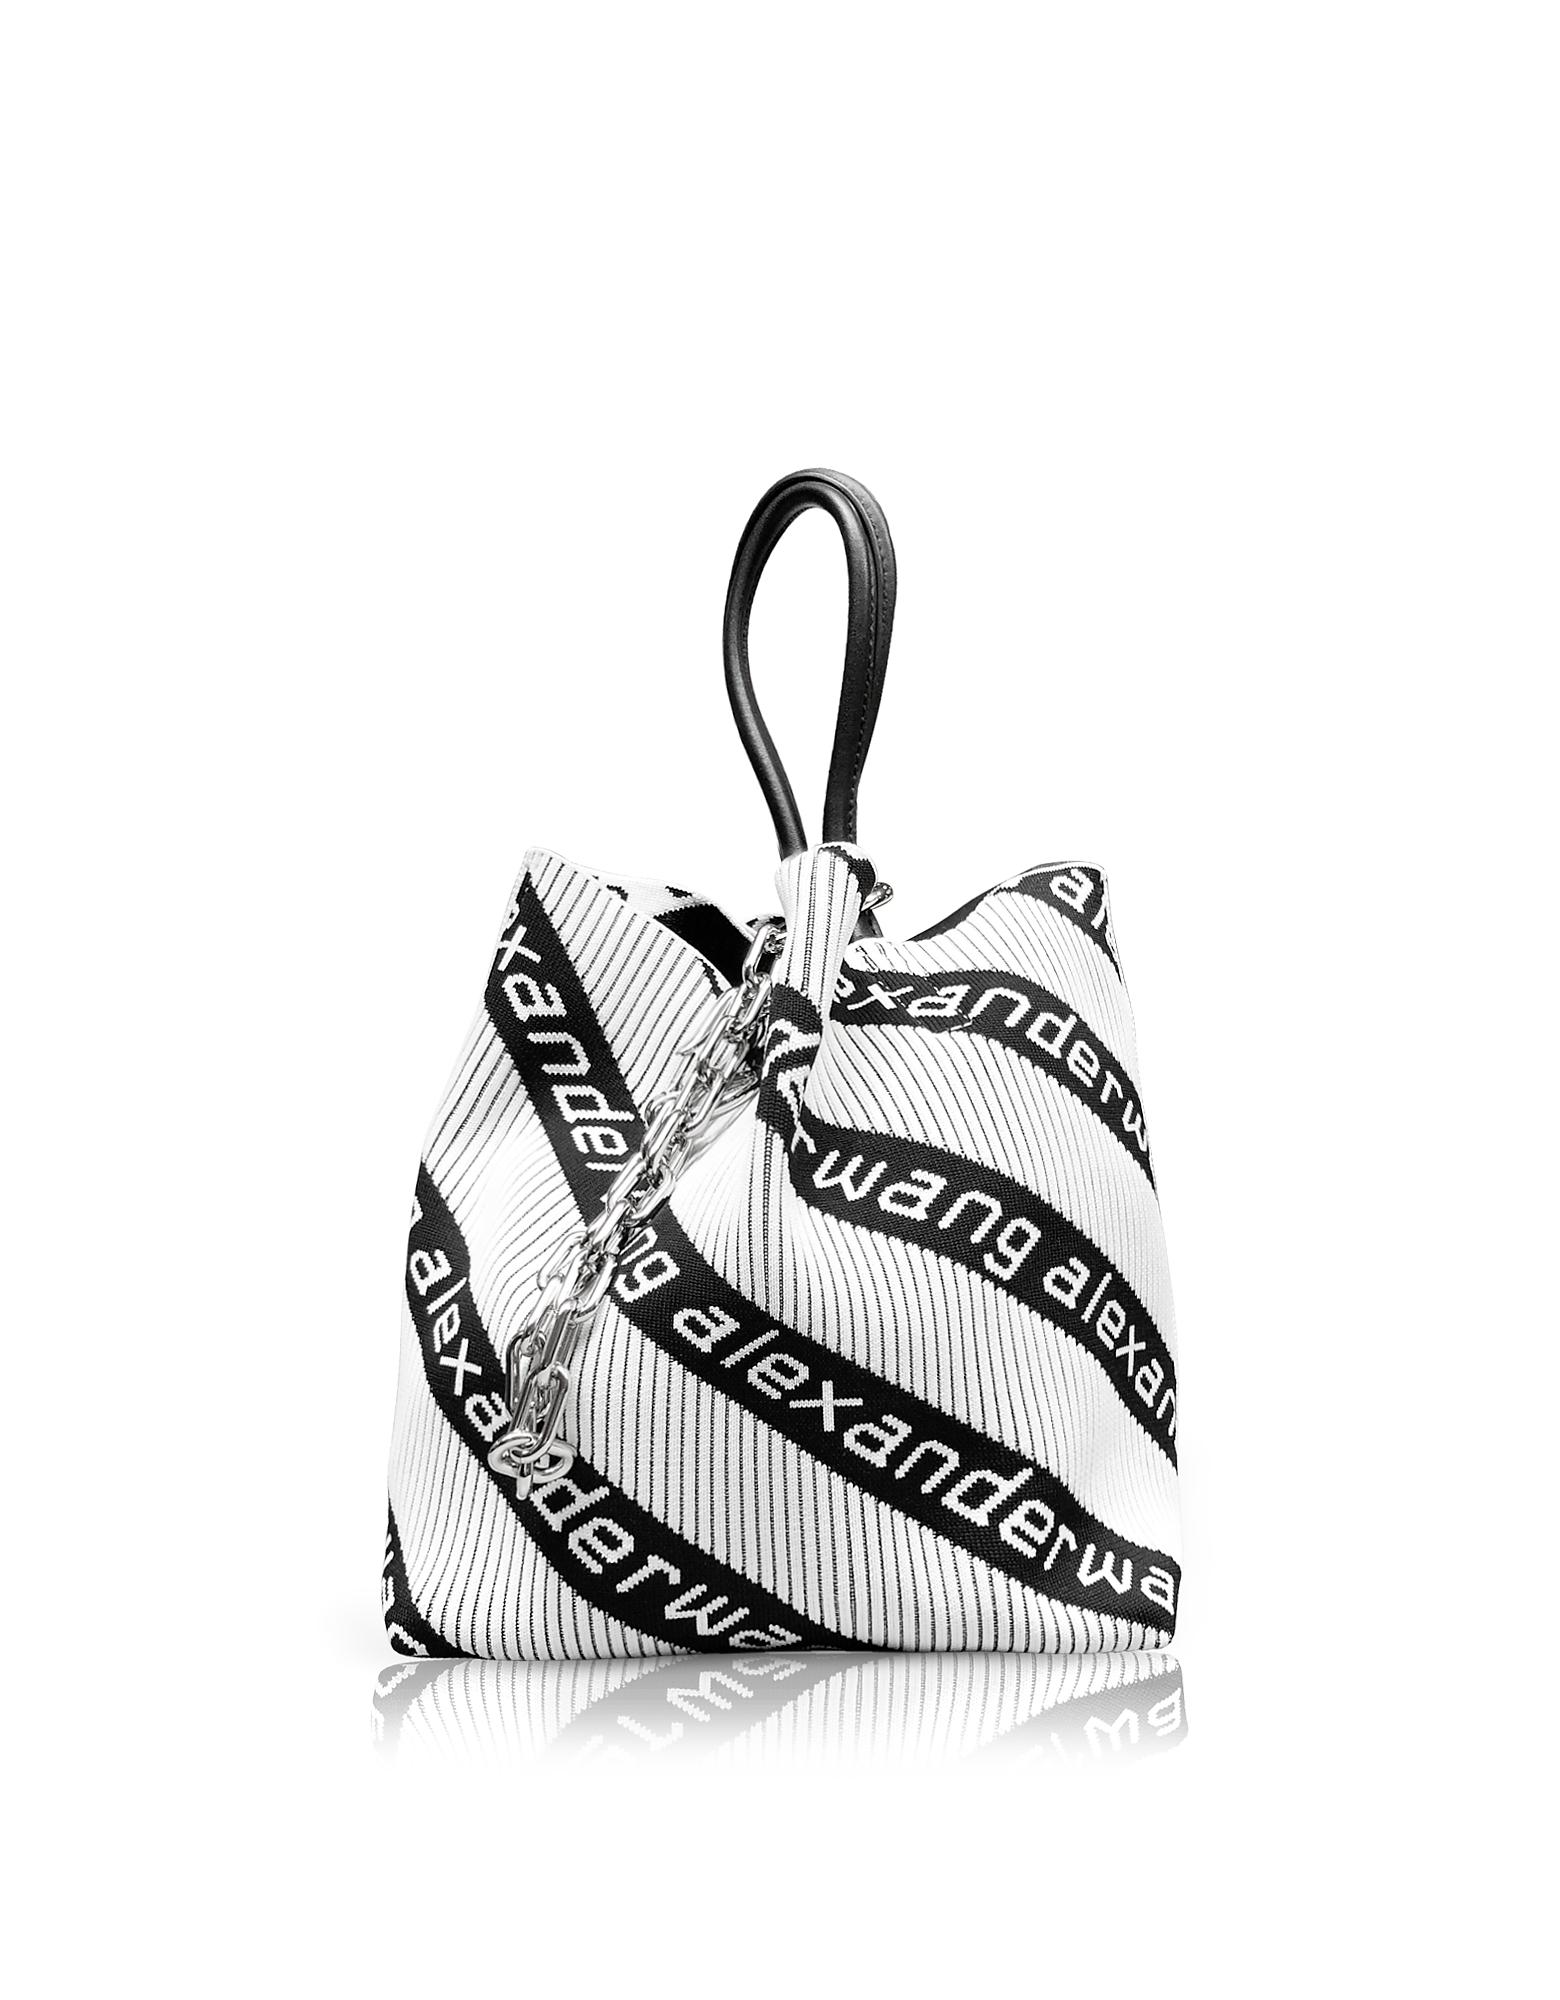 Kint Jacquard Logo Soft Striped Canvas Small Tote Bag in Black/White